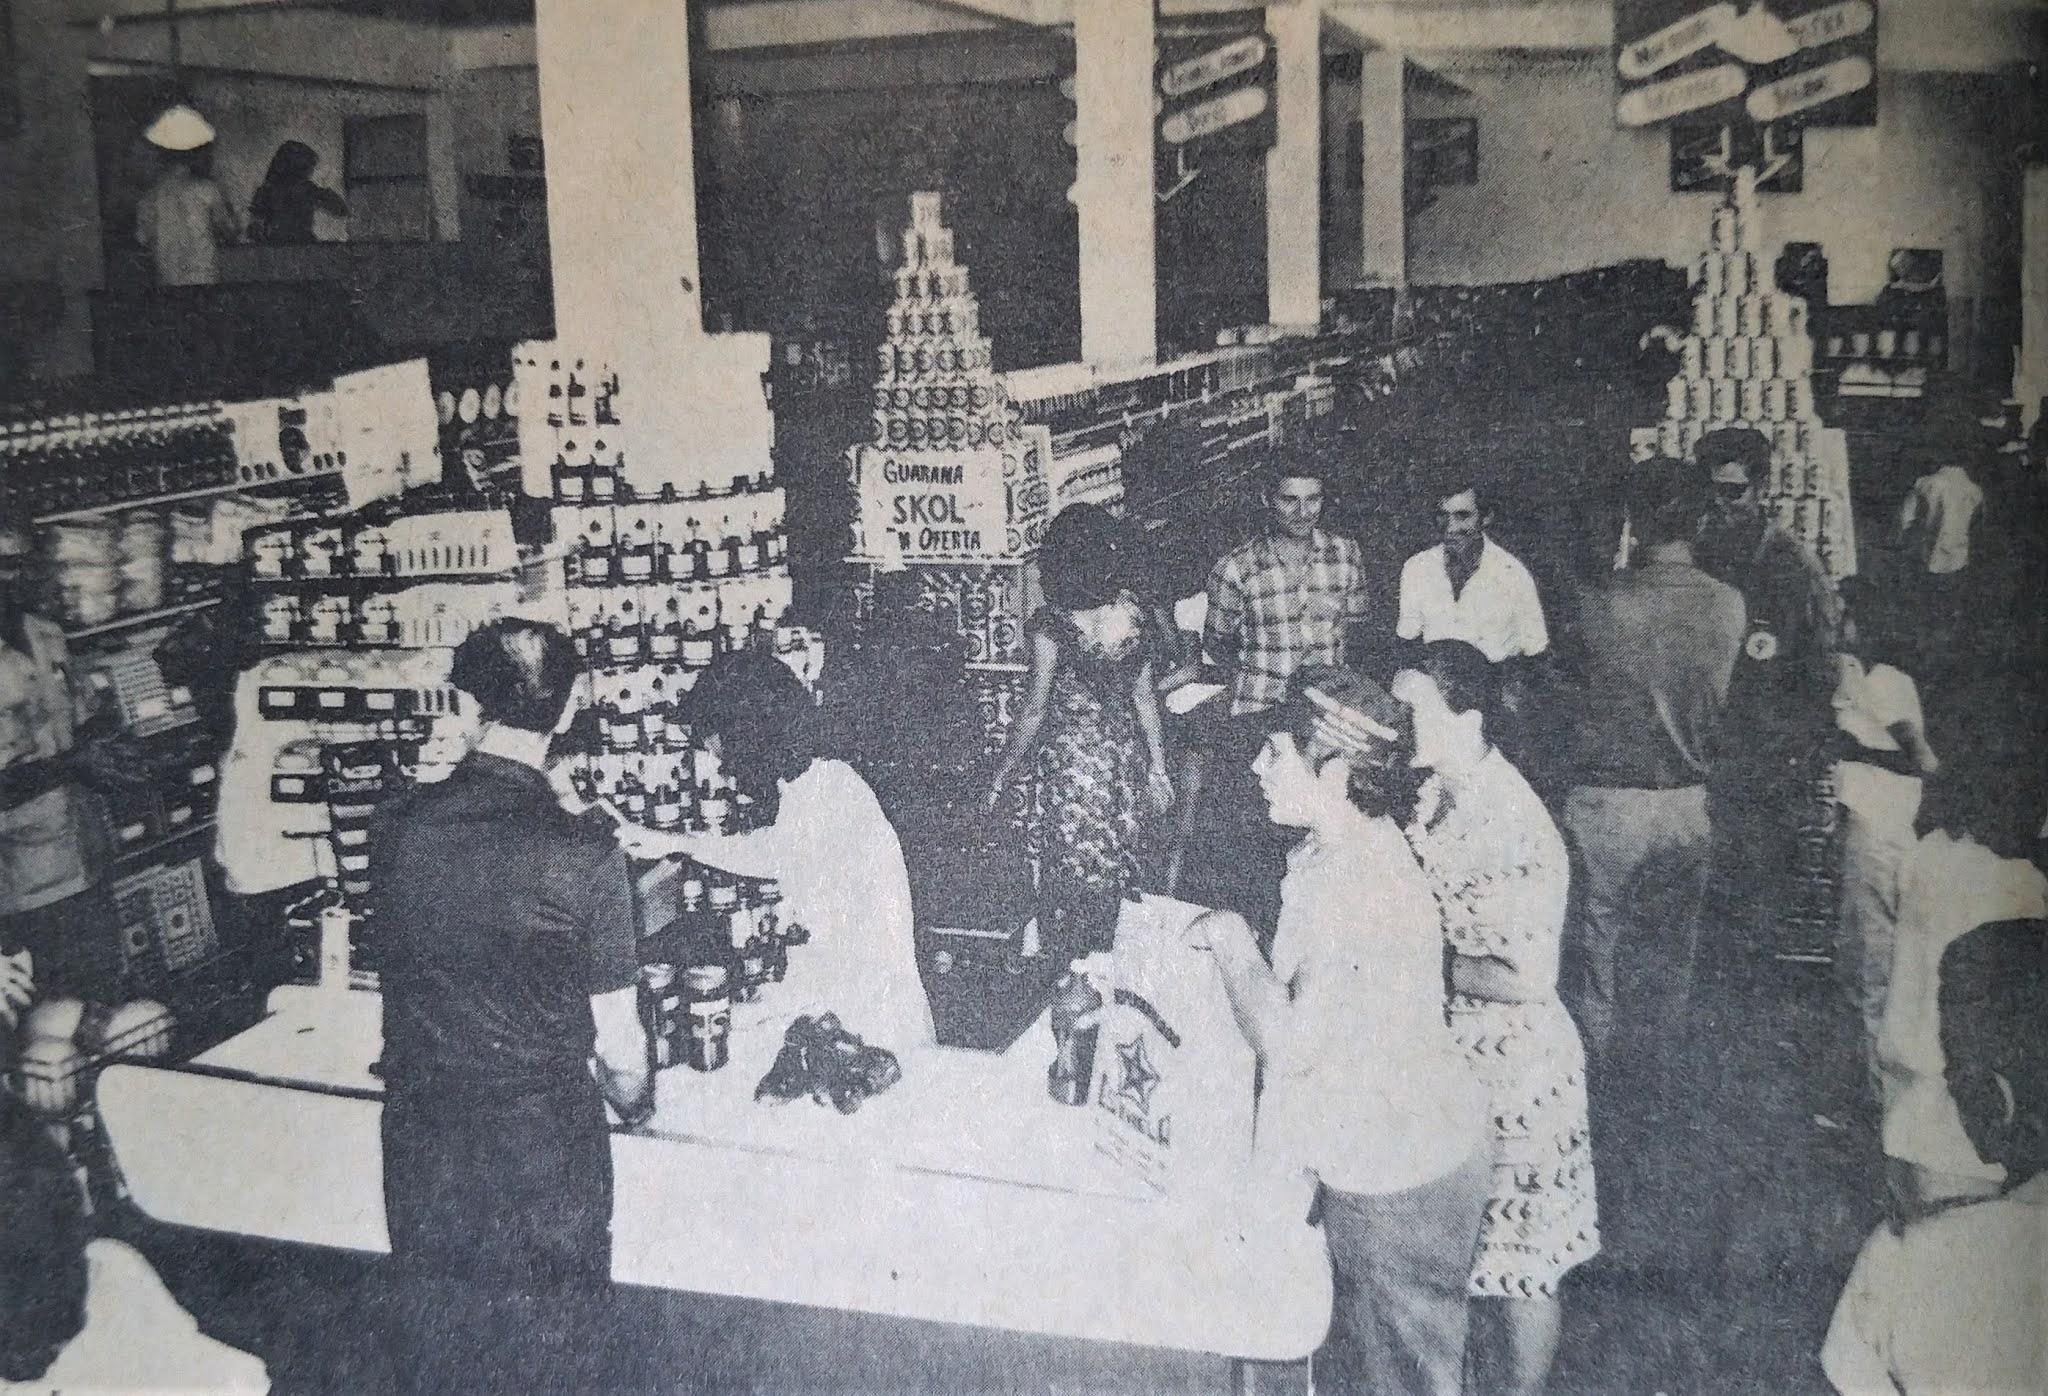 Supermercado Estrela - Final dos anos 1970